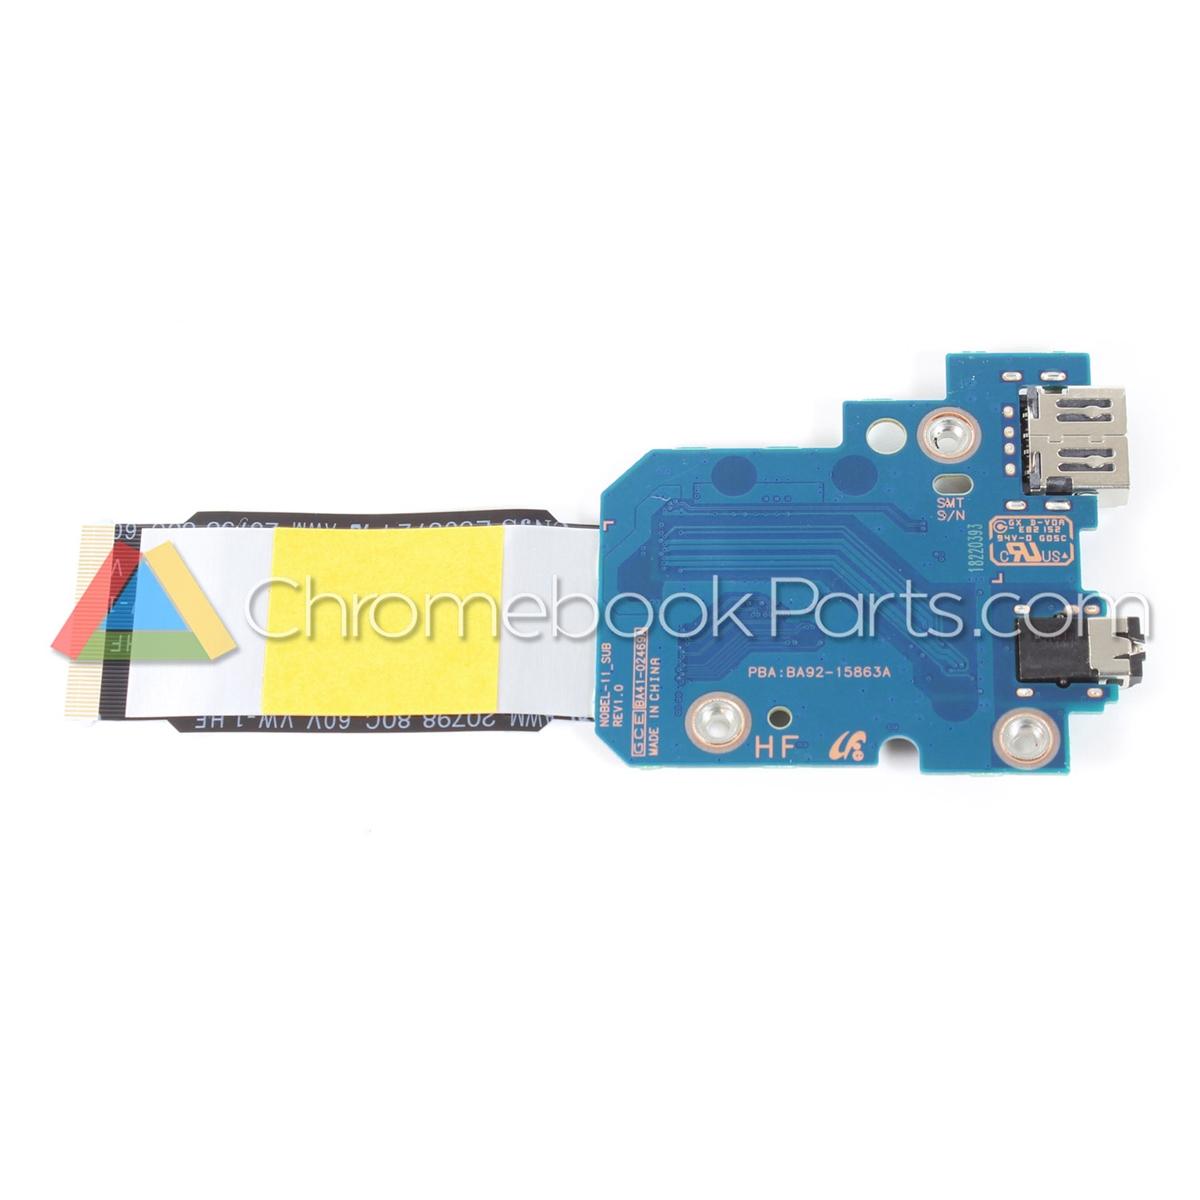 Samsung 11 XE500C13 Chromebook USB, Audio, & Wifi Daughterboard